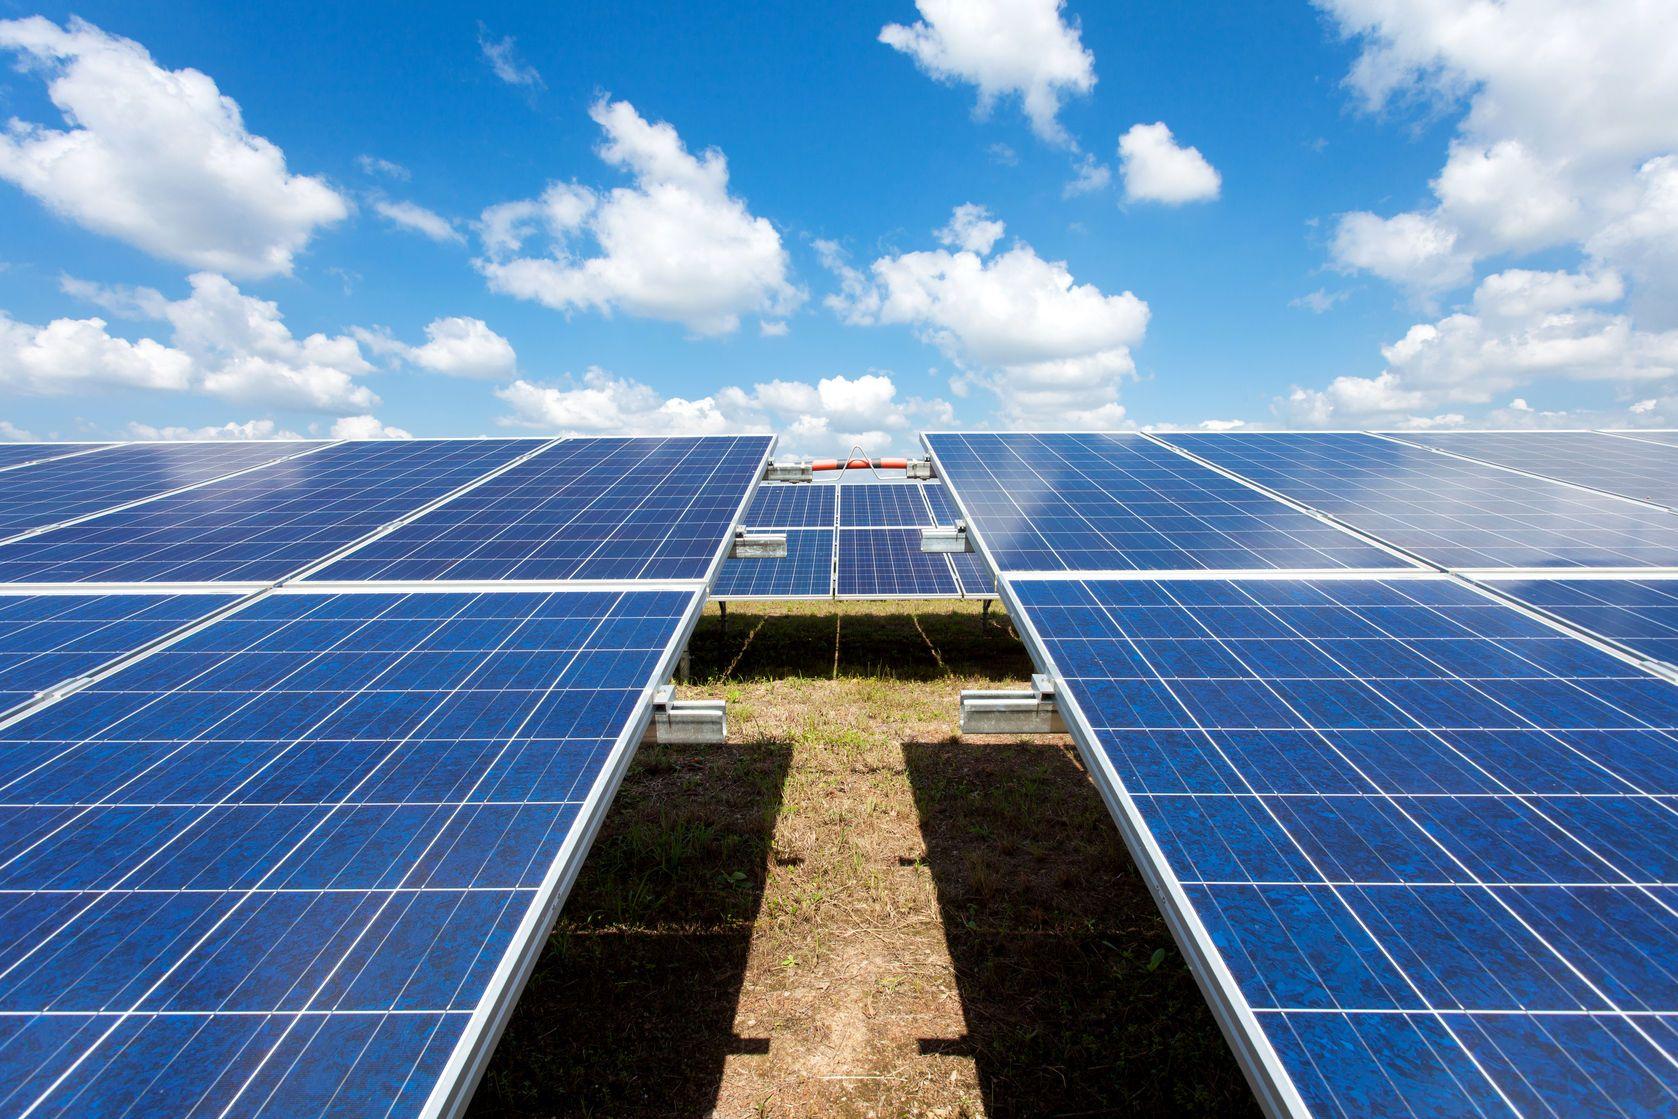 India Opens One Of The World S Largest Solar Power Plants Digital Trends Solar Farm Solar Energy Solar Power Plant